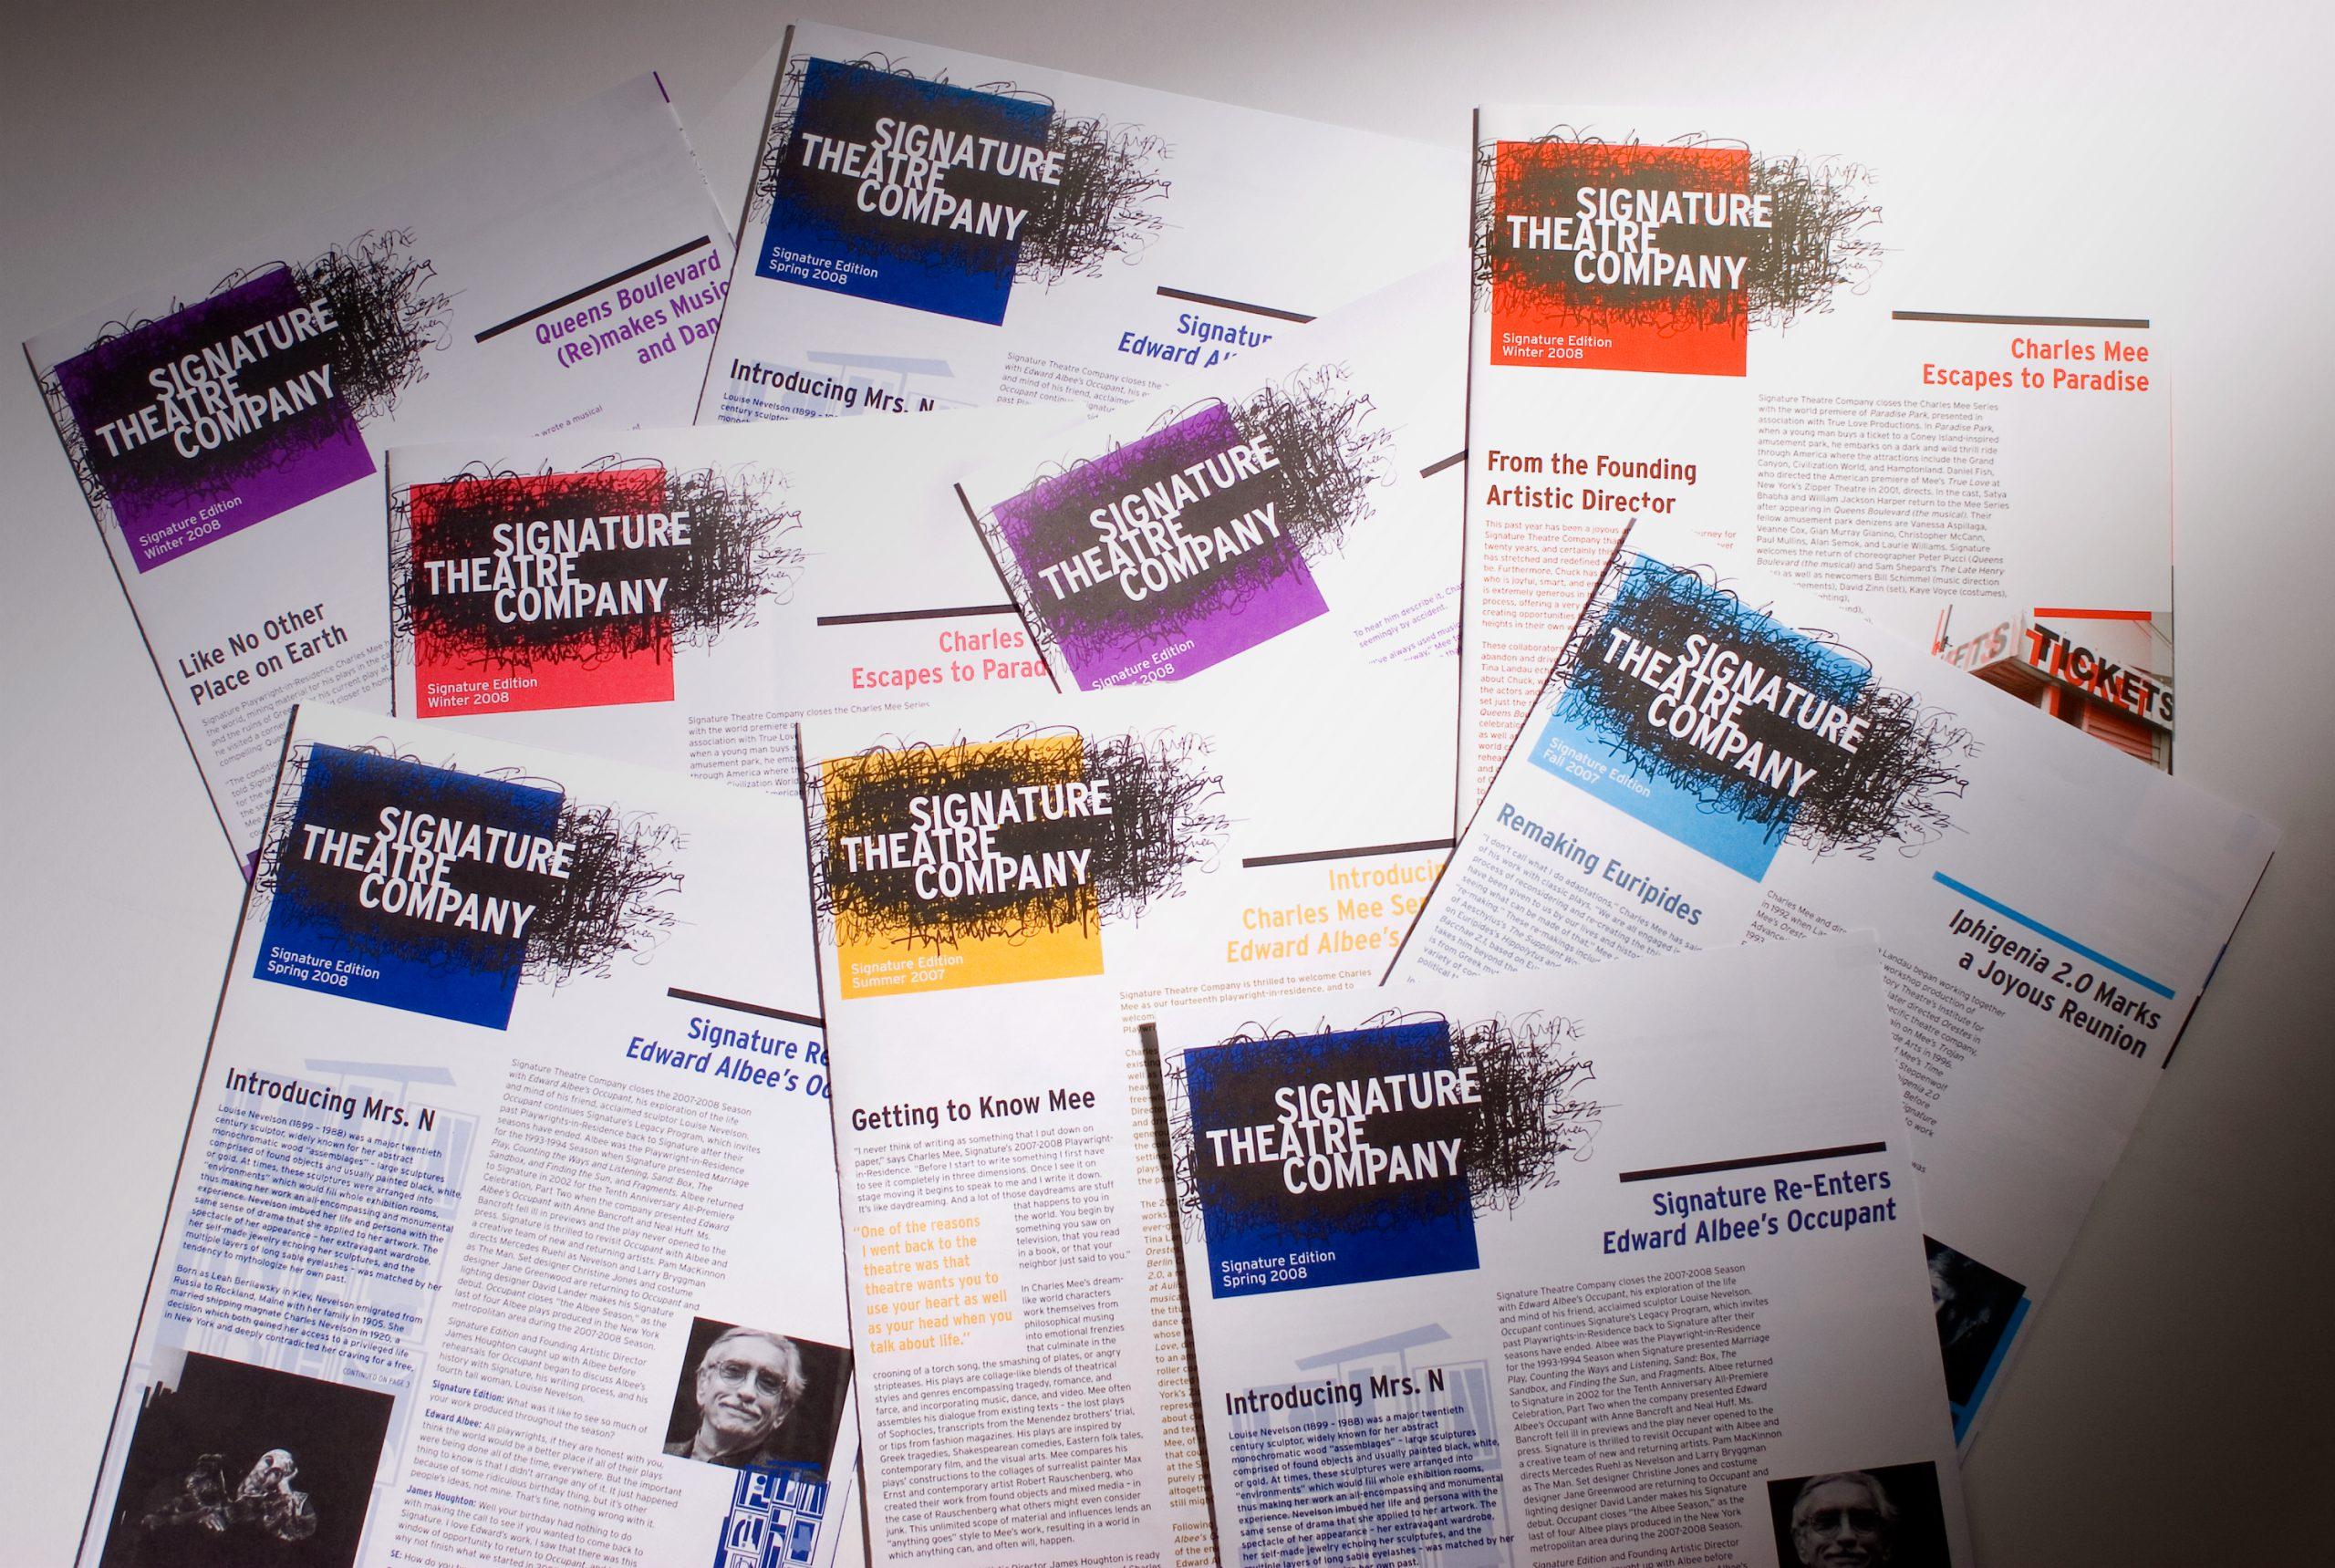 Project image 2 for Print Materials, Signature Theatre Company